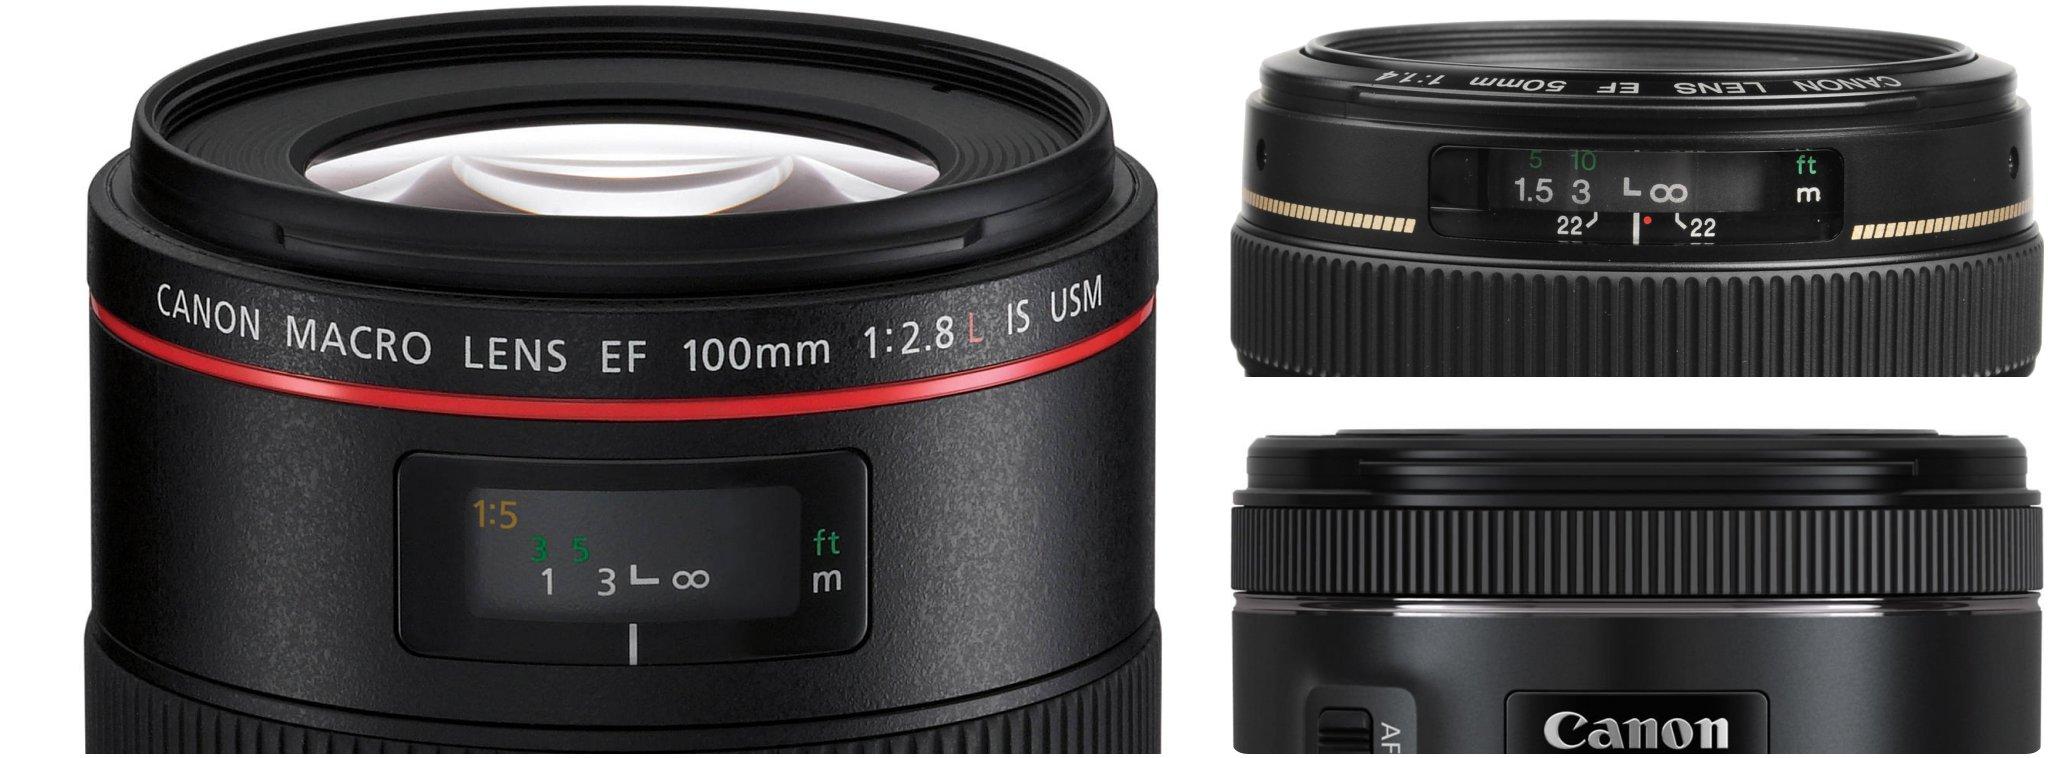 EF-lens - Camera.tinhte.vn.jpg